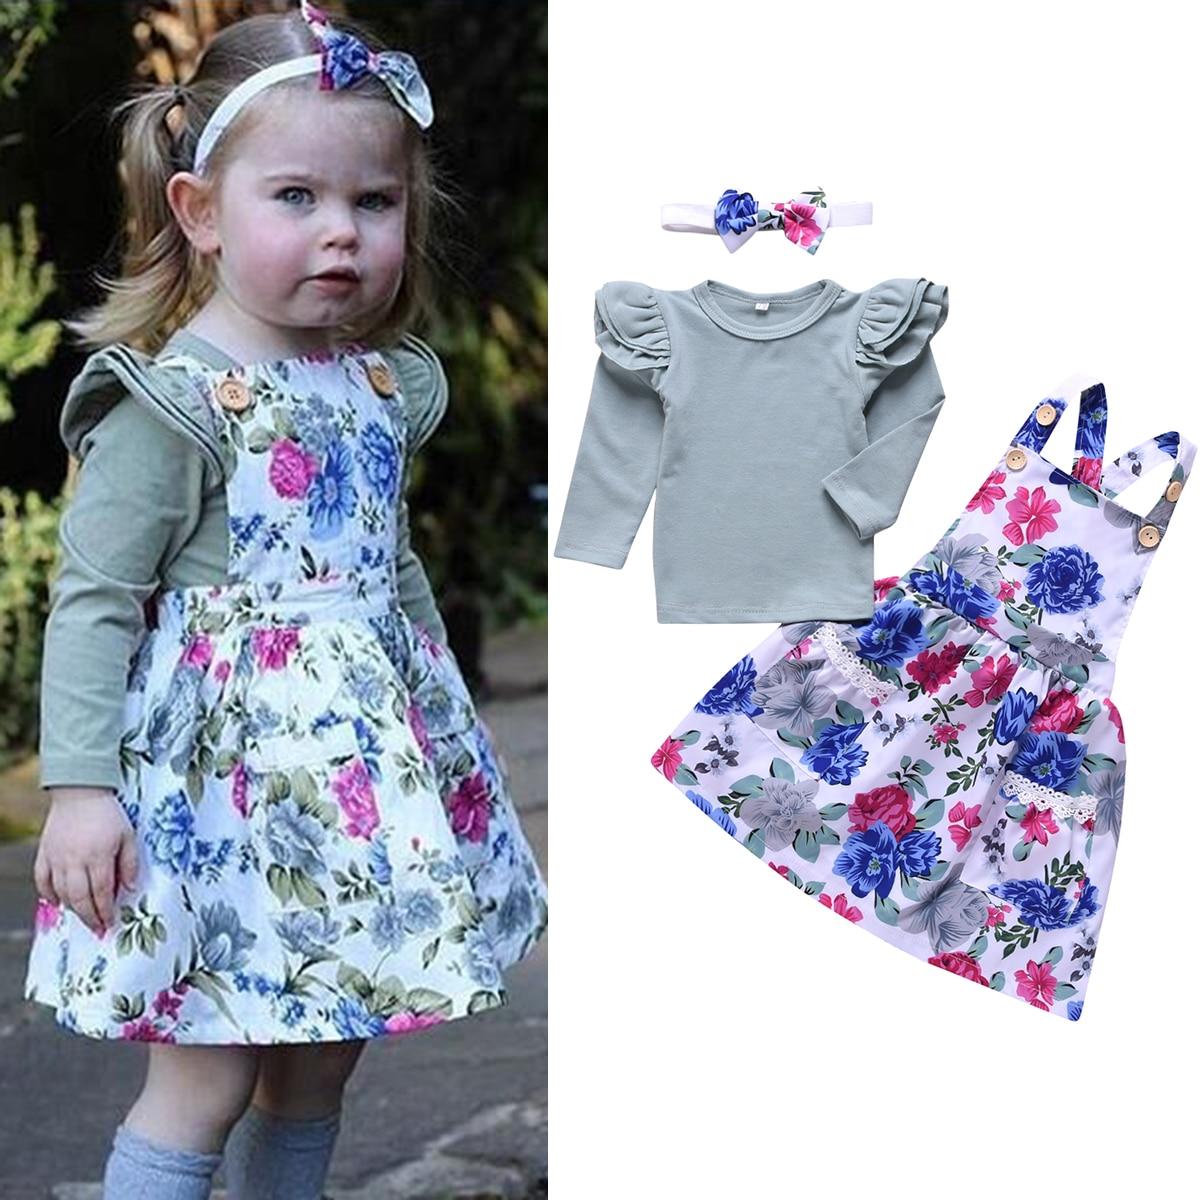 Baby Toddler Girl Casual Outfit Set Long Sleeve Ruffles Top Suspender Skirt Bowknot Headband 3pcs/set Summer Dress For Girl